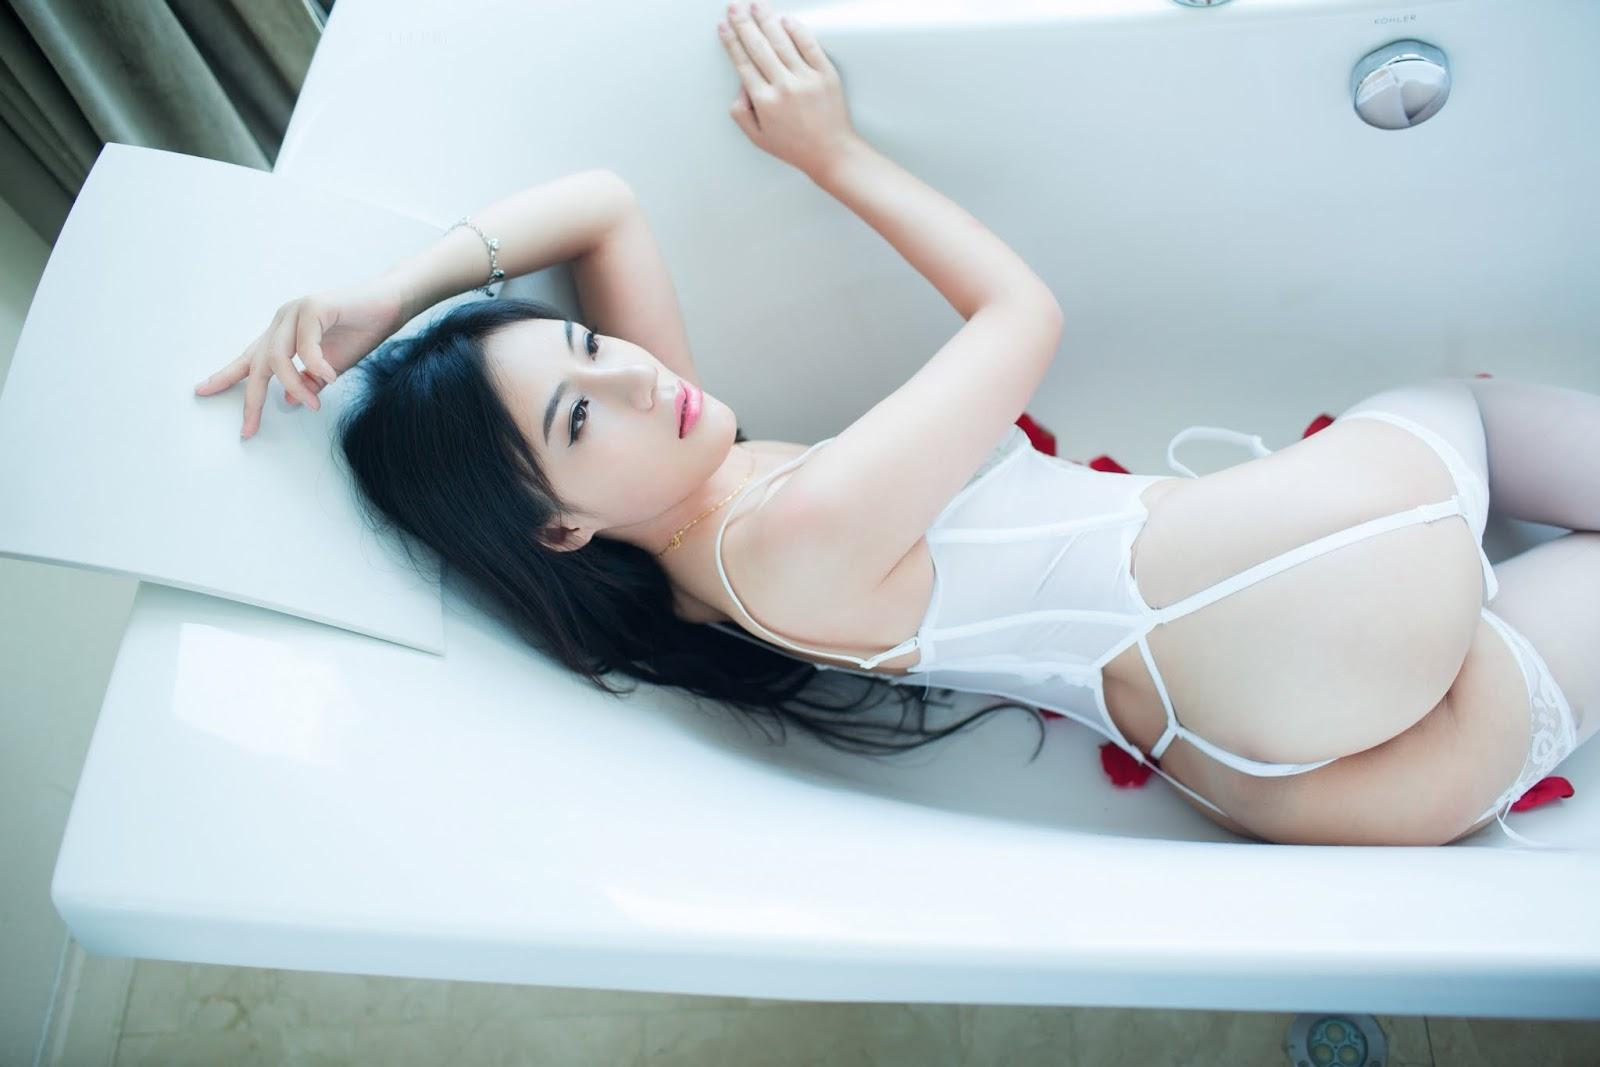 %25C2%25AC%252BO 21 - Hot Sexy Model TUIGIRL NO.46 Nude